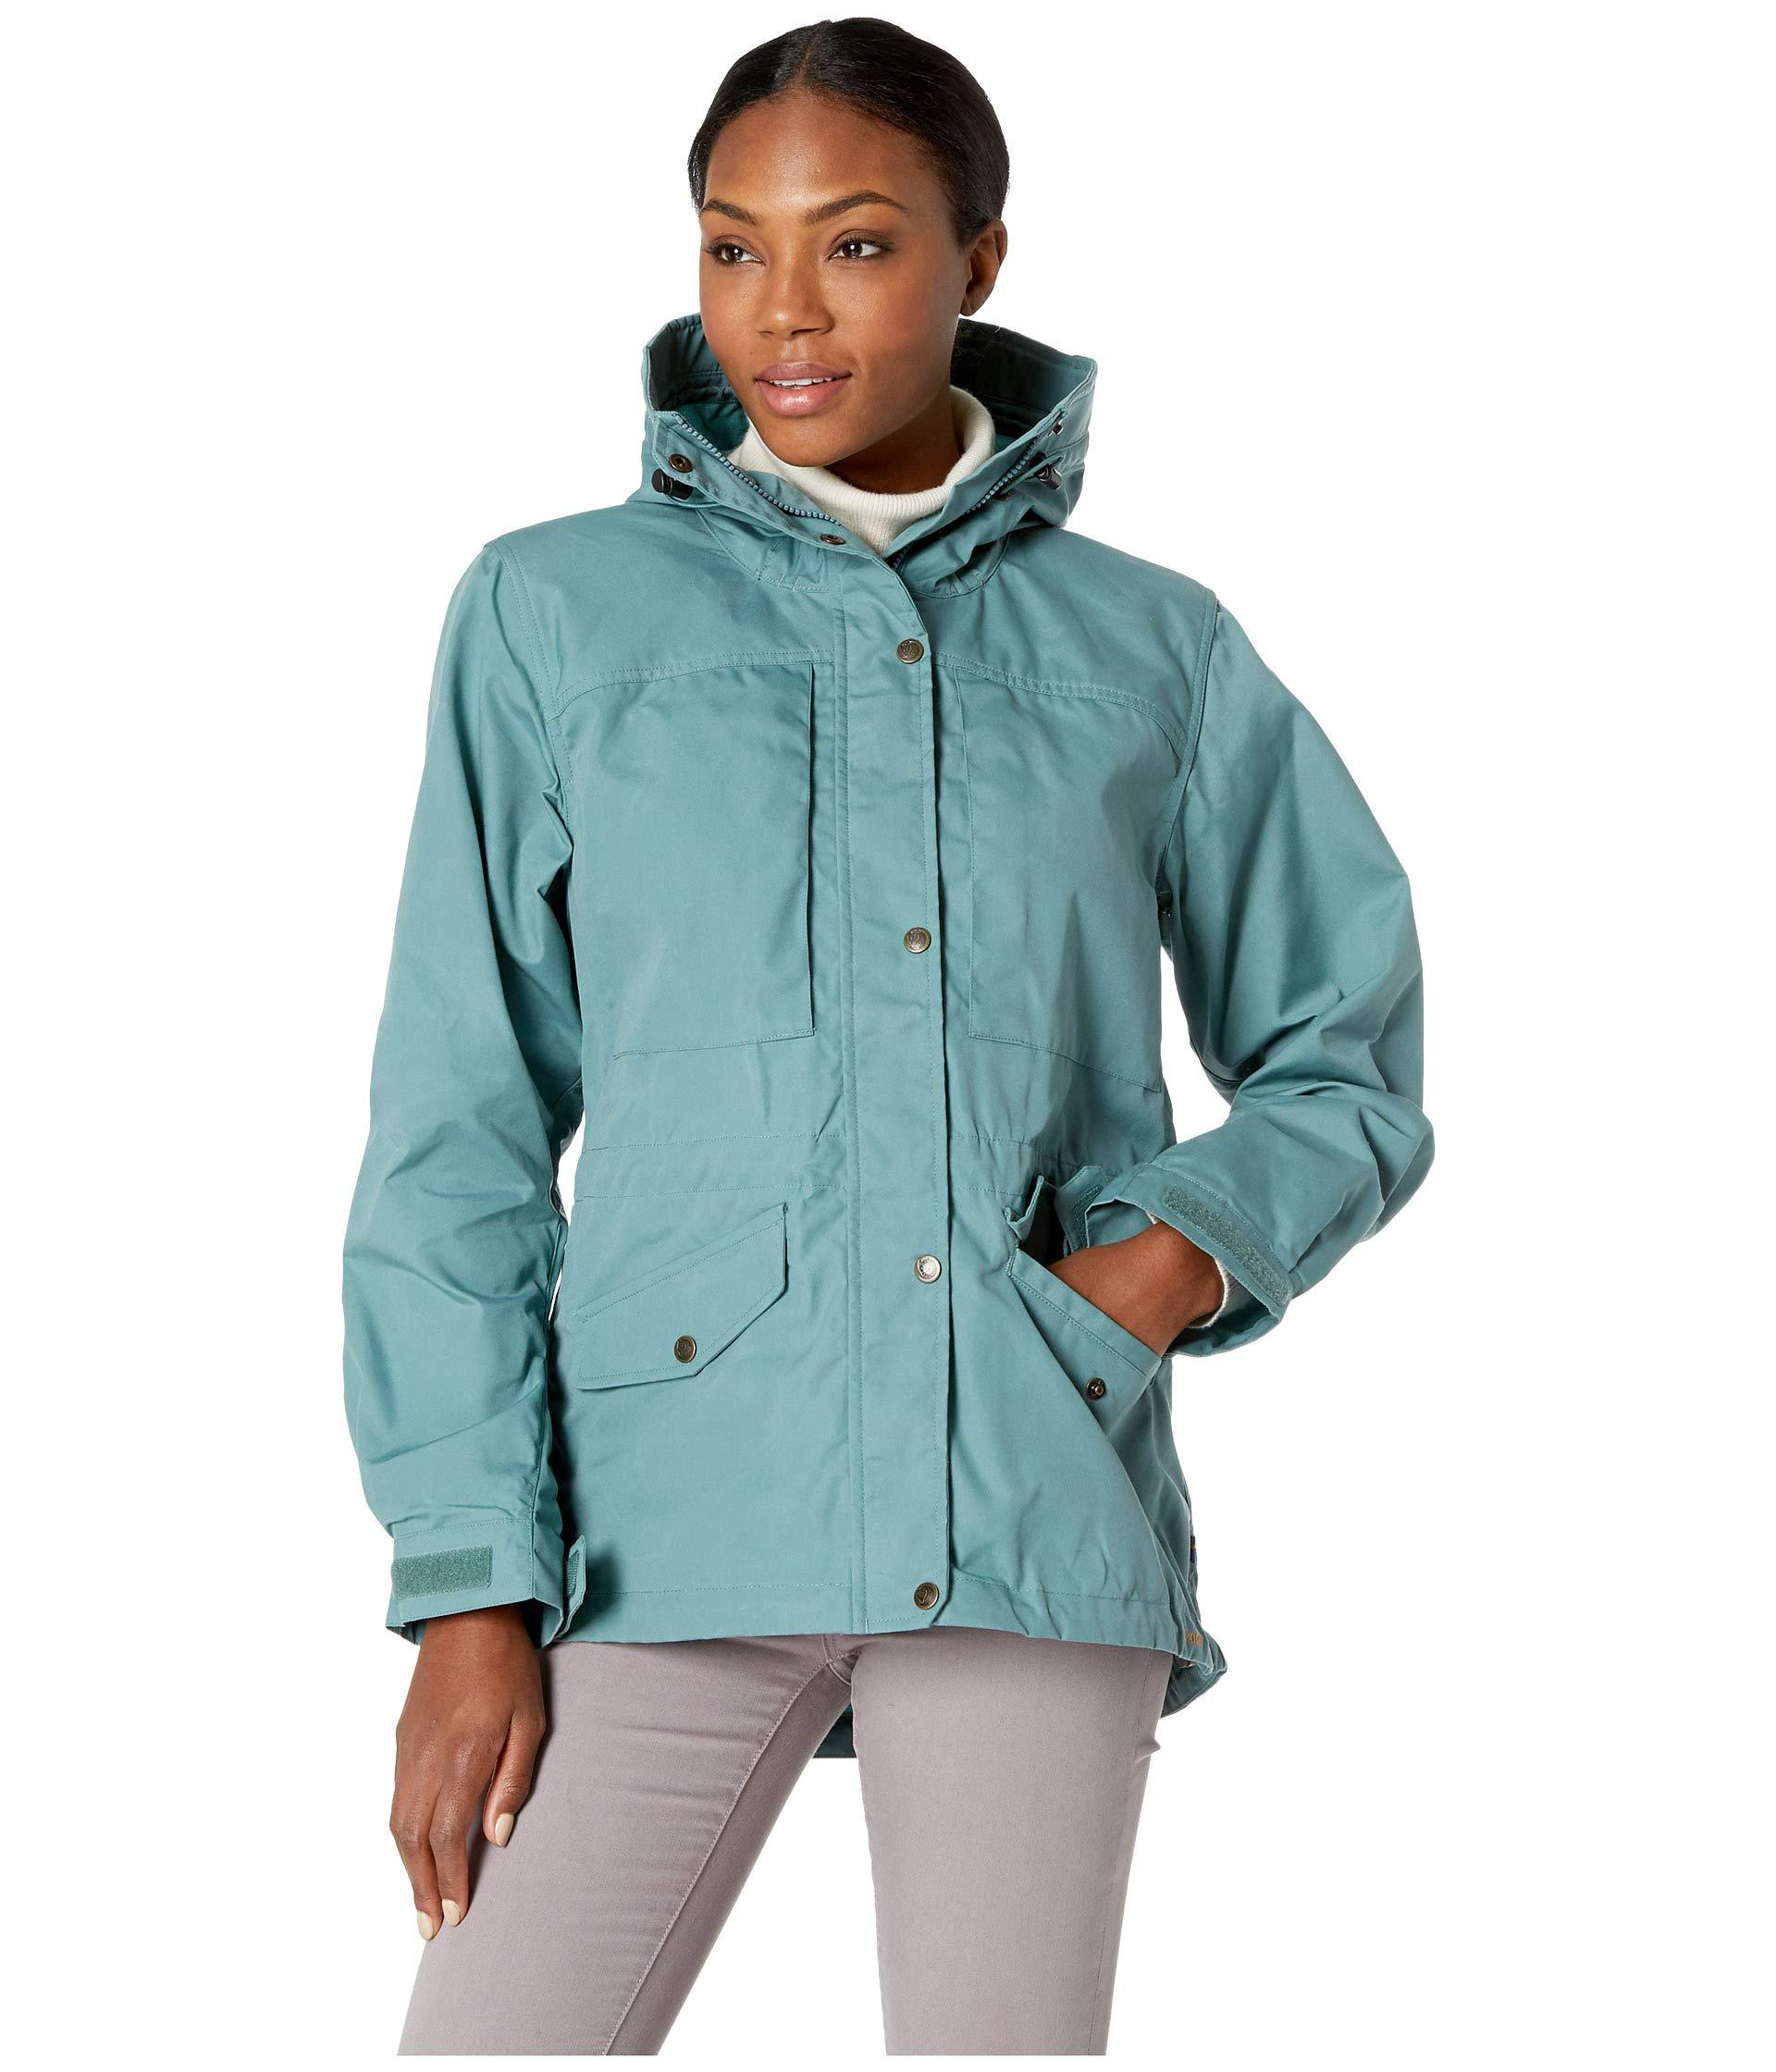 498df0080d8 Lyst - Fjallraven Sarek Trekking Jacket (frost Green) Women s Jacket ...